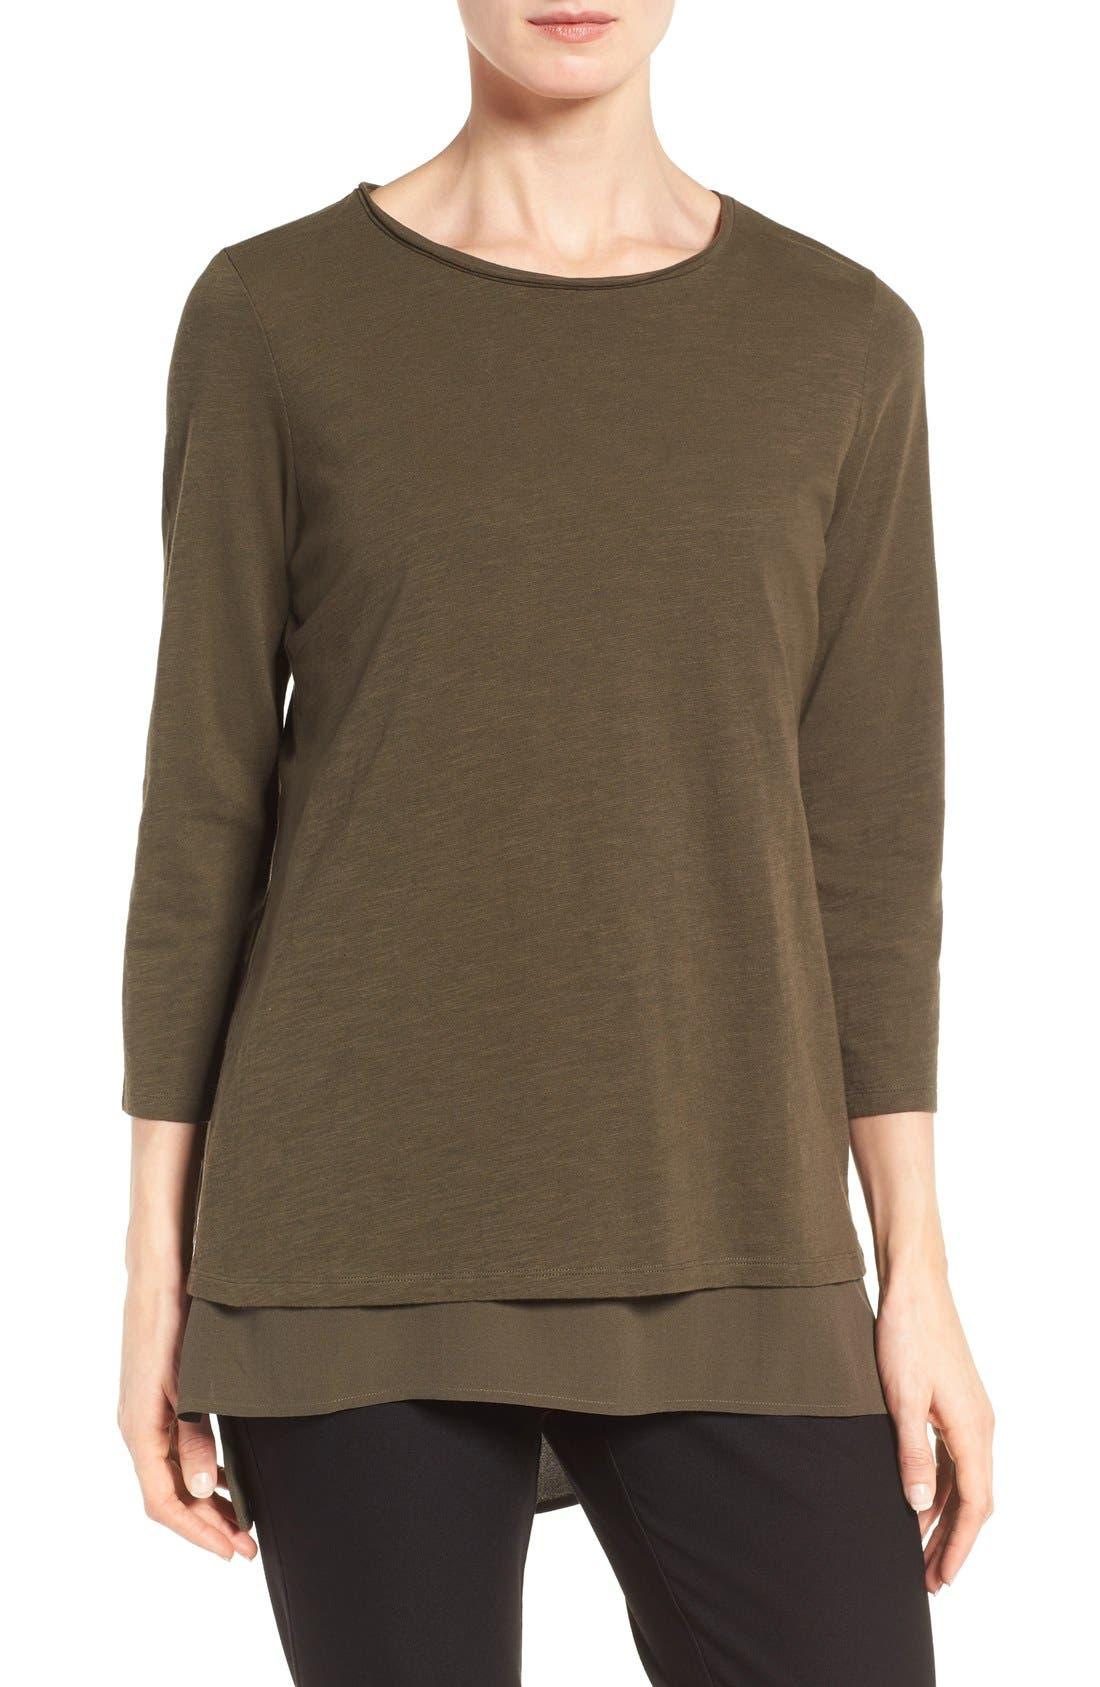 Main Image - Eileen Fisher Slubby Organic Cotton Jersey Top